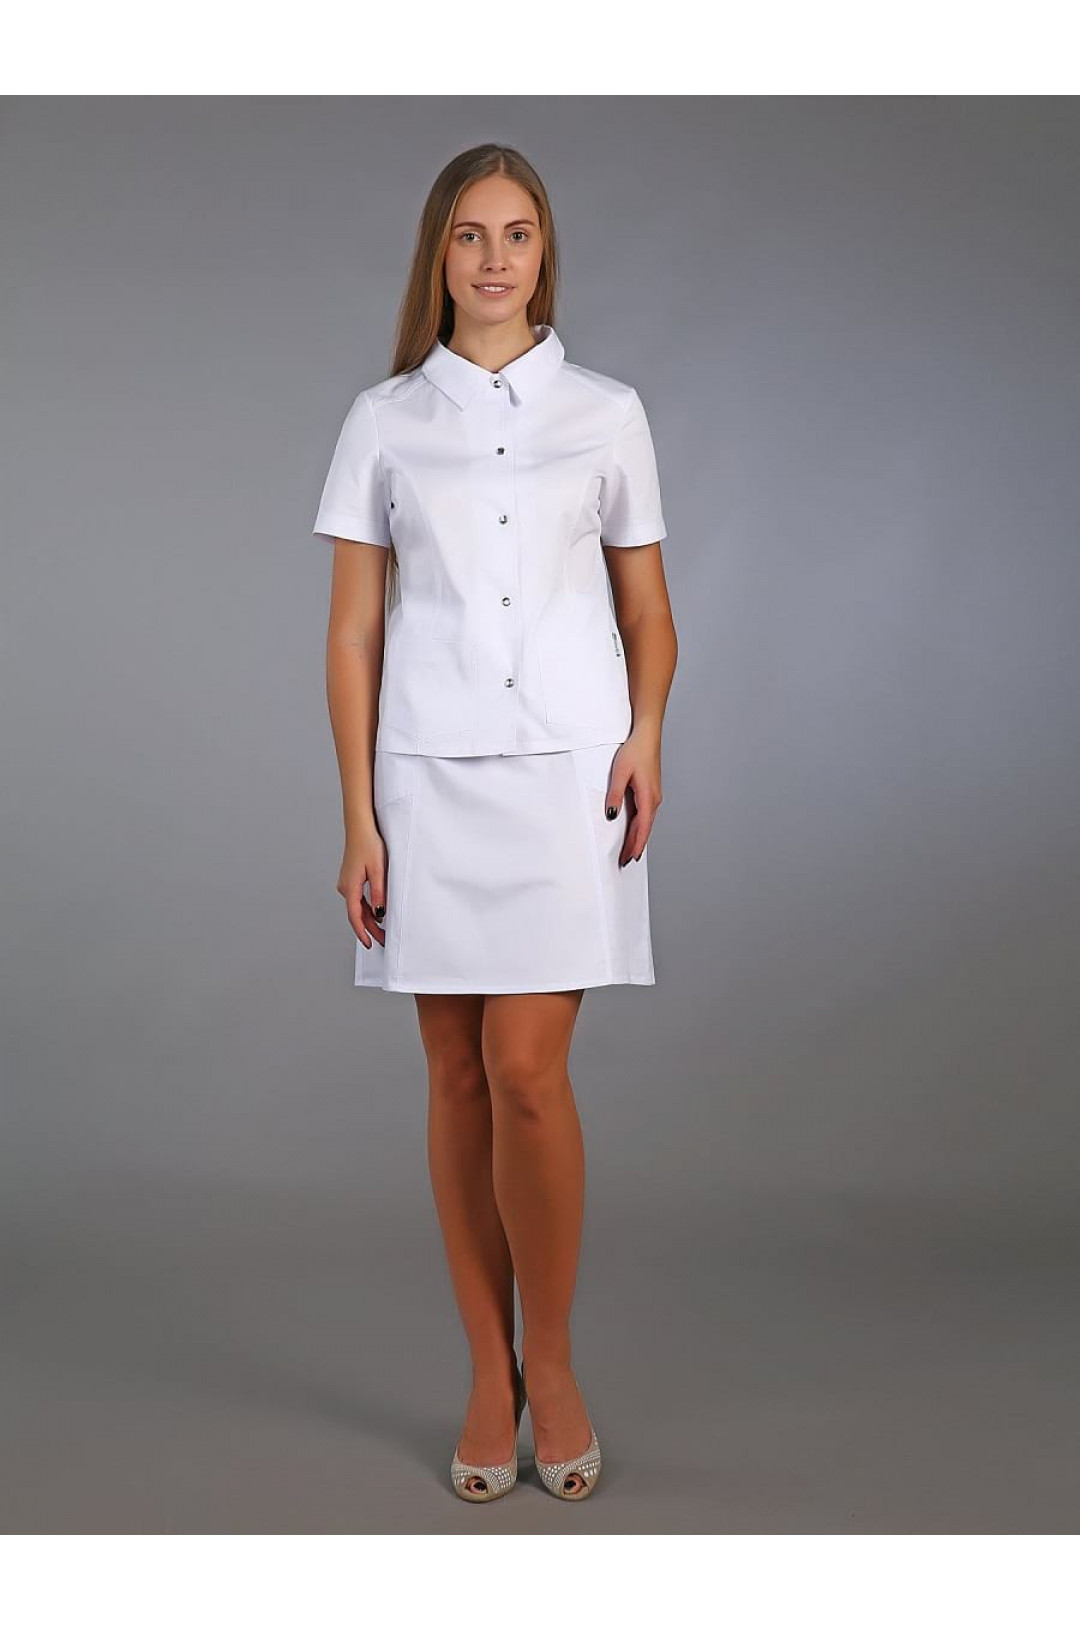 Жакет медицинский женский М-240 (белый, сатори)